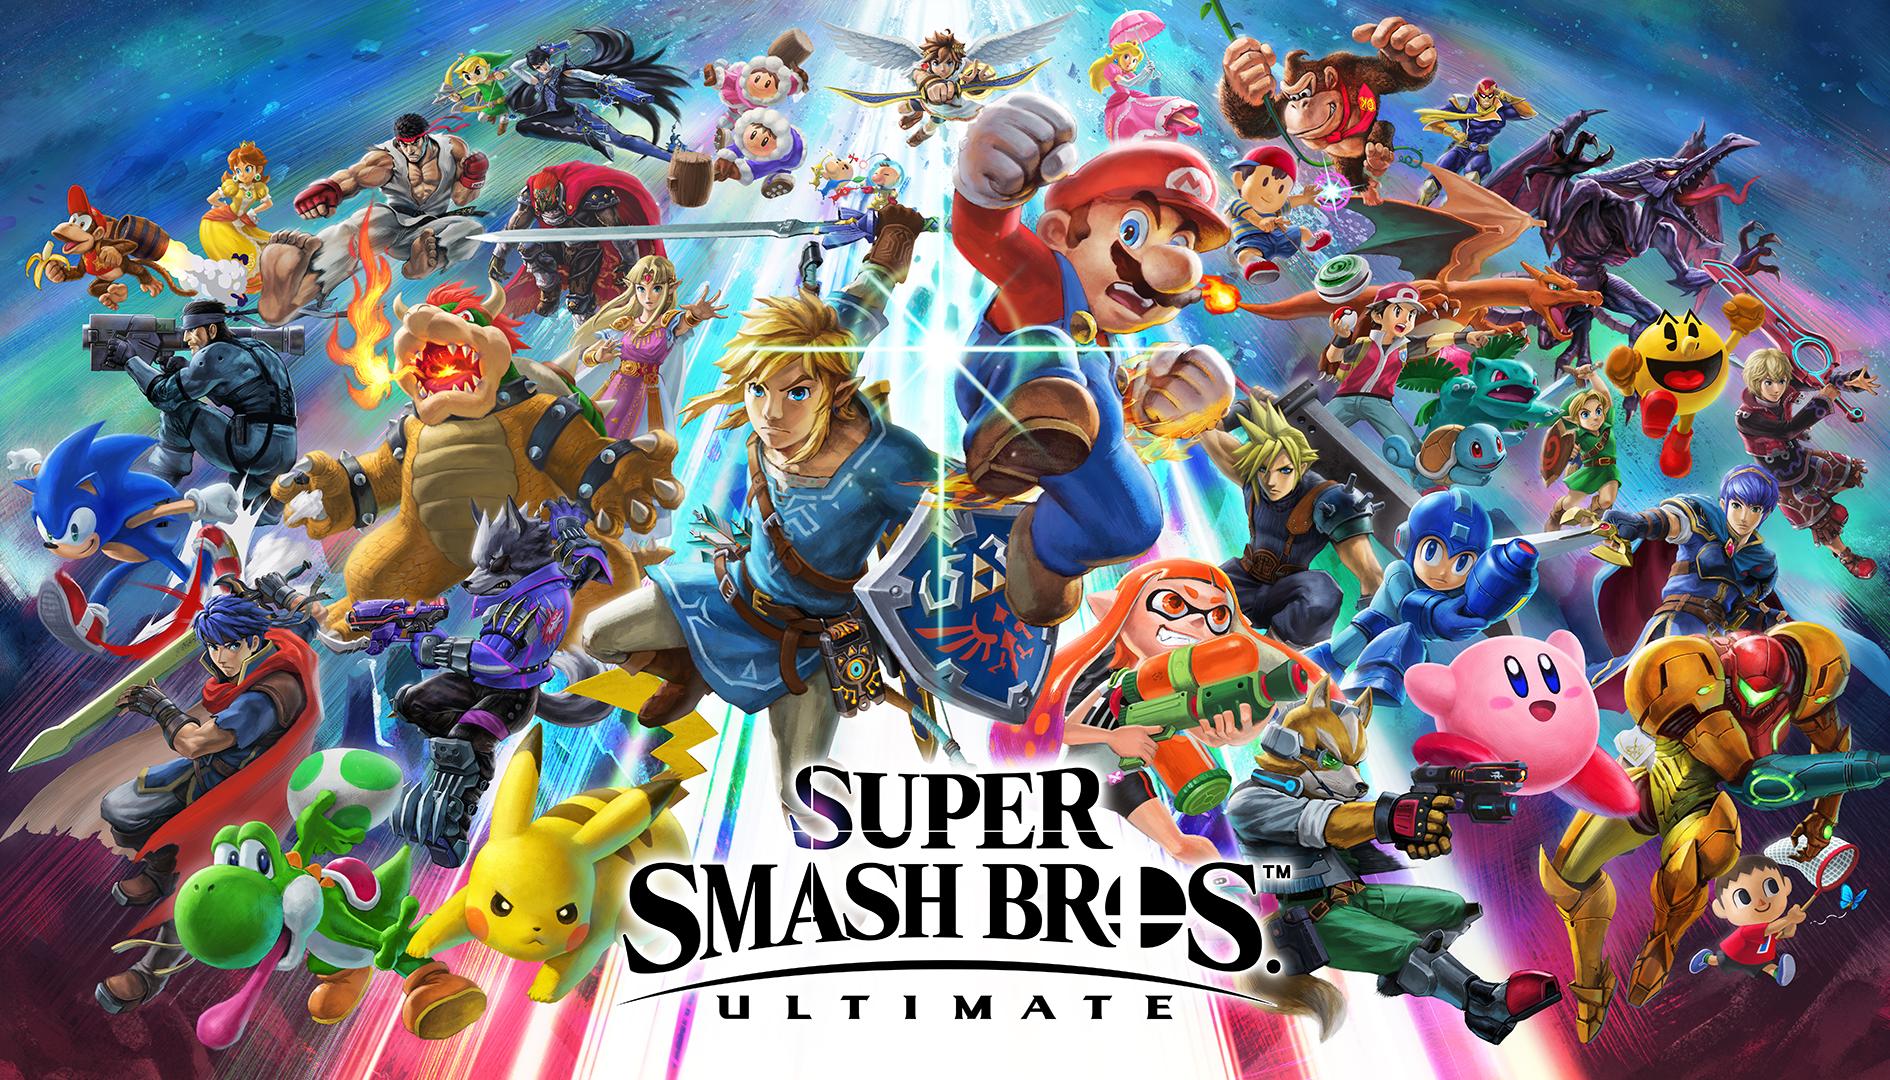 Super Smash Bros Ultimate: Sora avrebbe potuto far parte del roster?